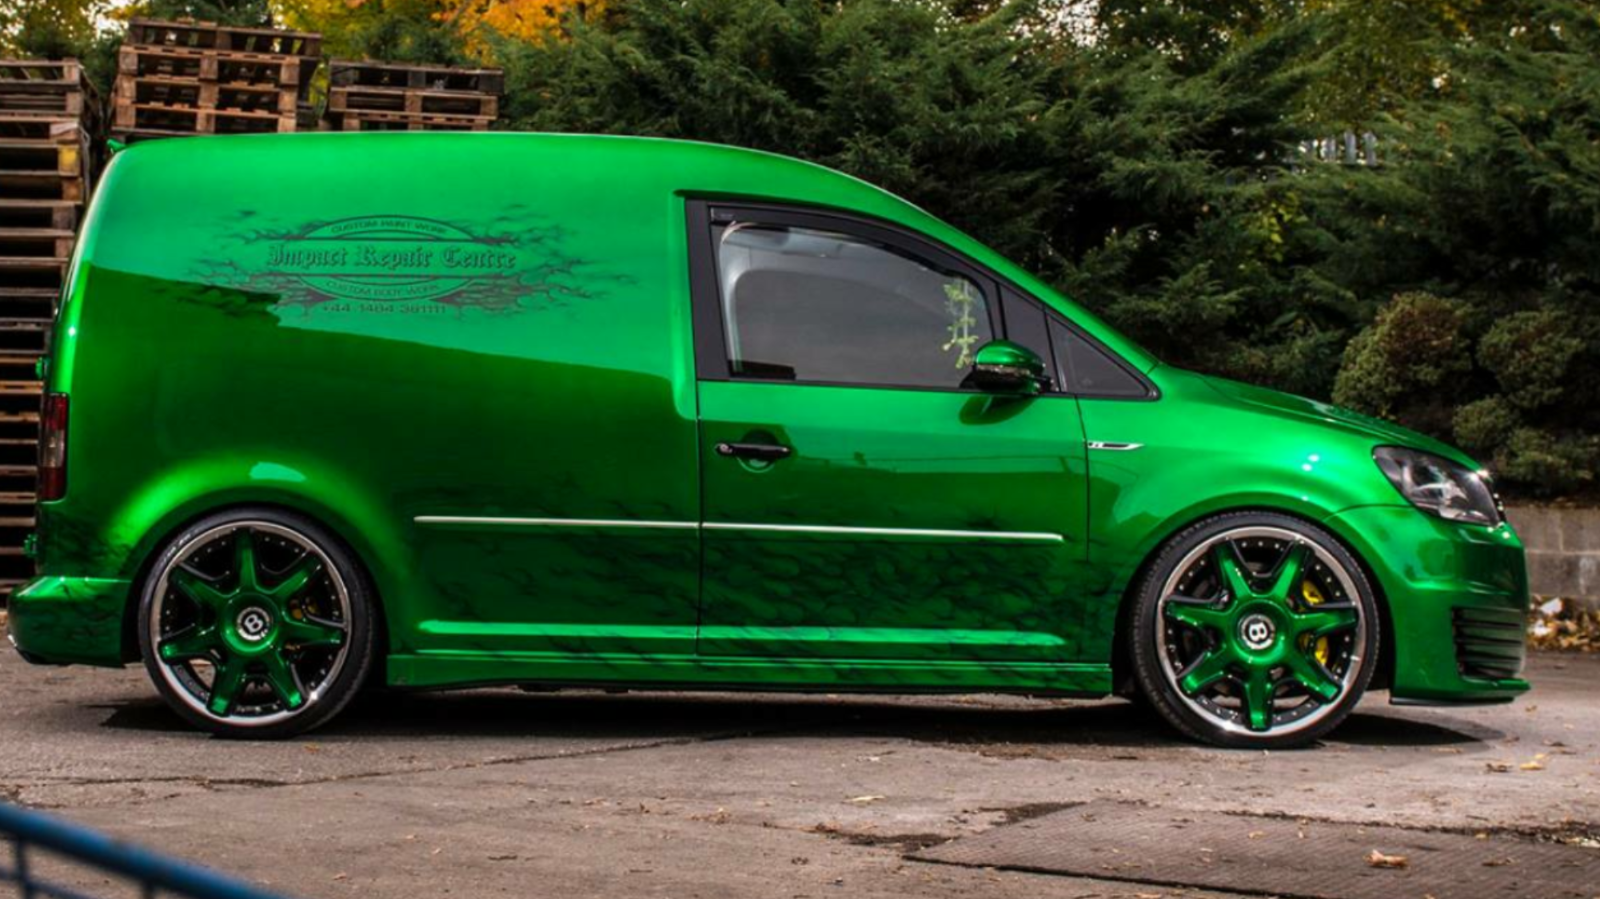 Vw caddy 2 0 custom van | evo parts build | Custom vans